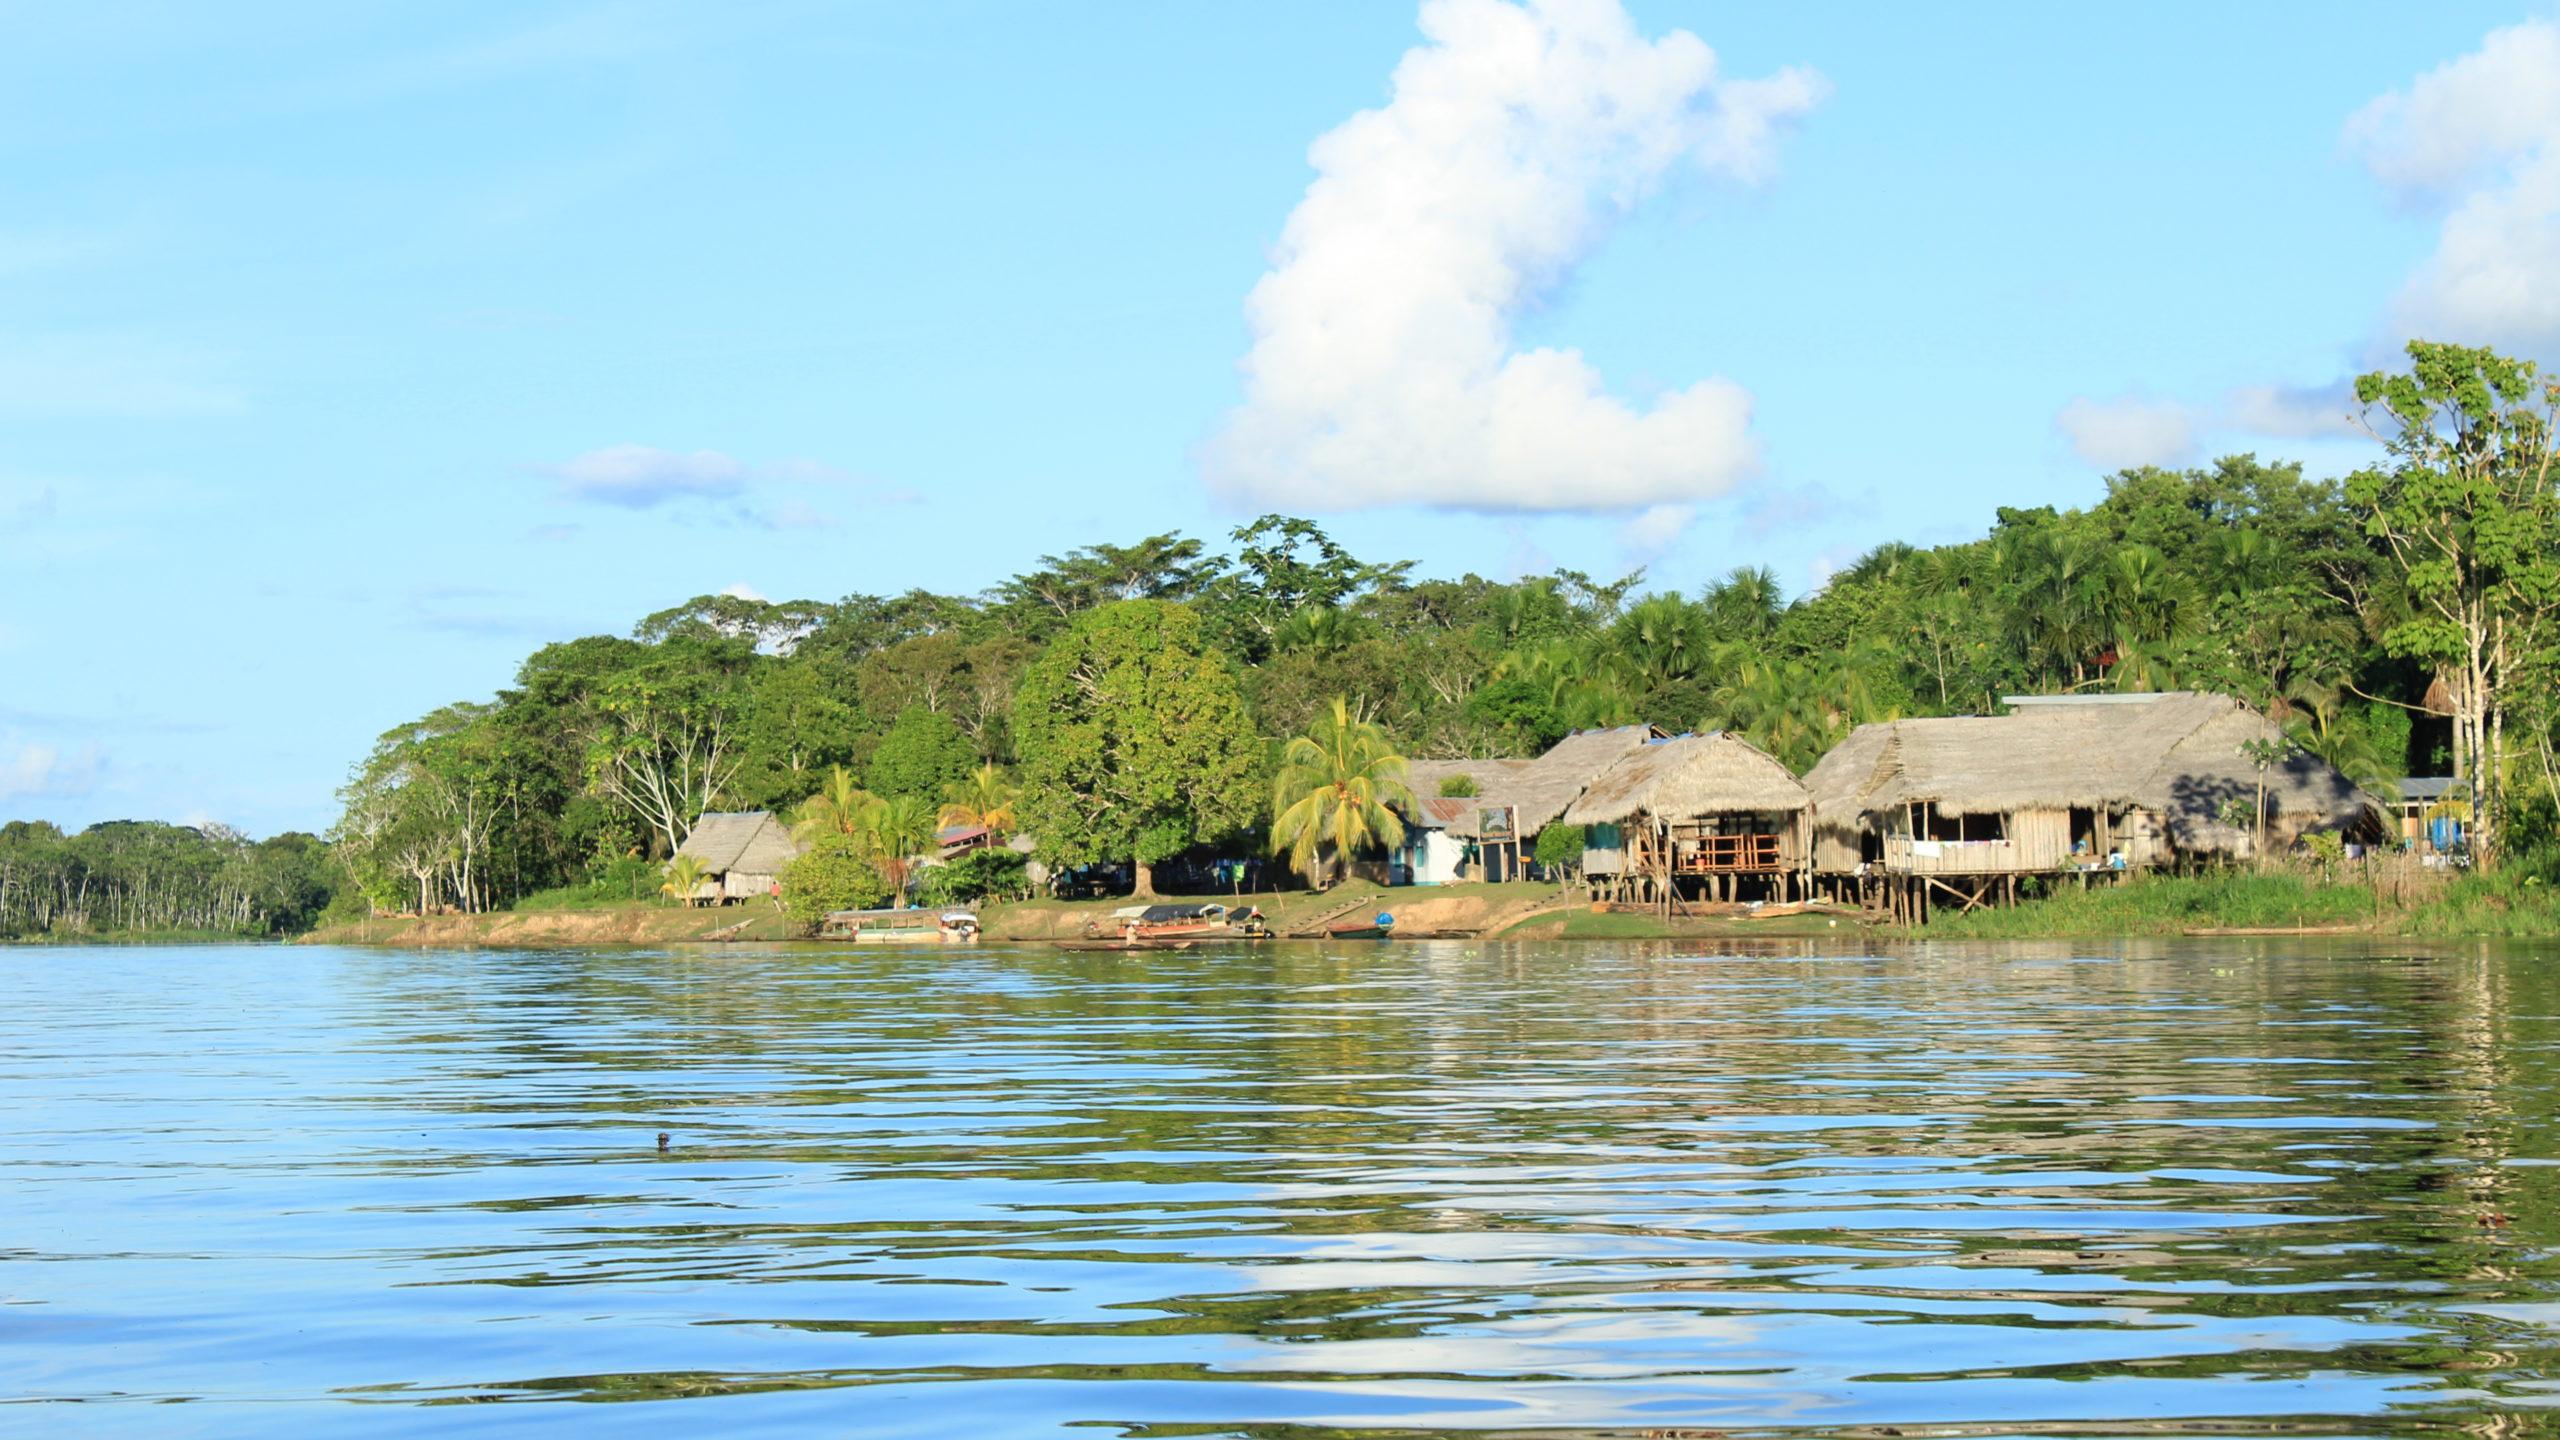 Buenos Aires, Pacaya Samiria National Reserve, Peruvian Amazon